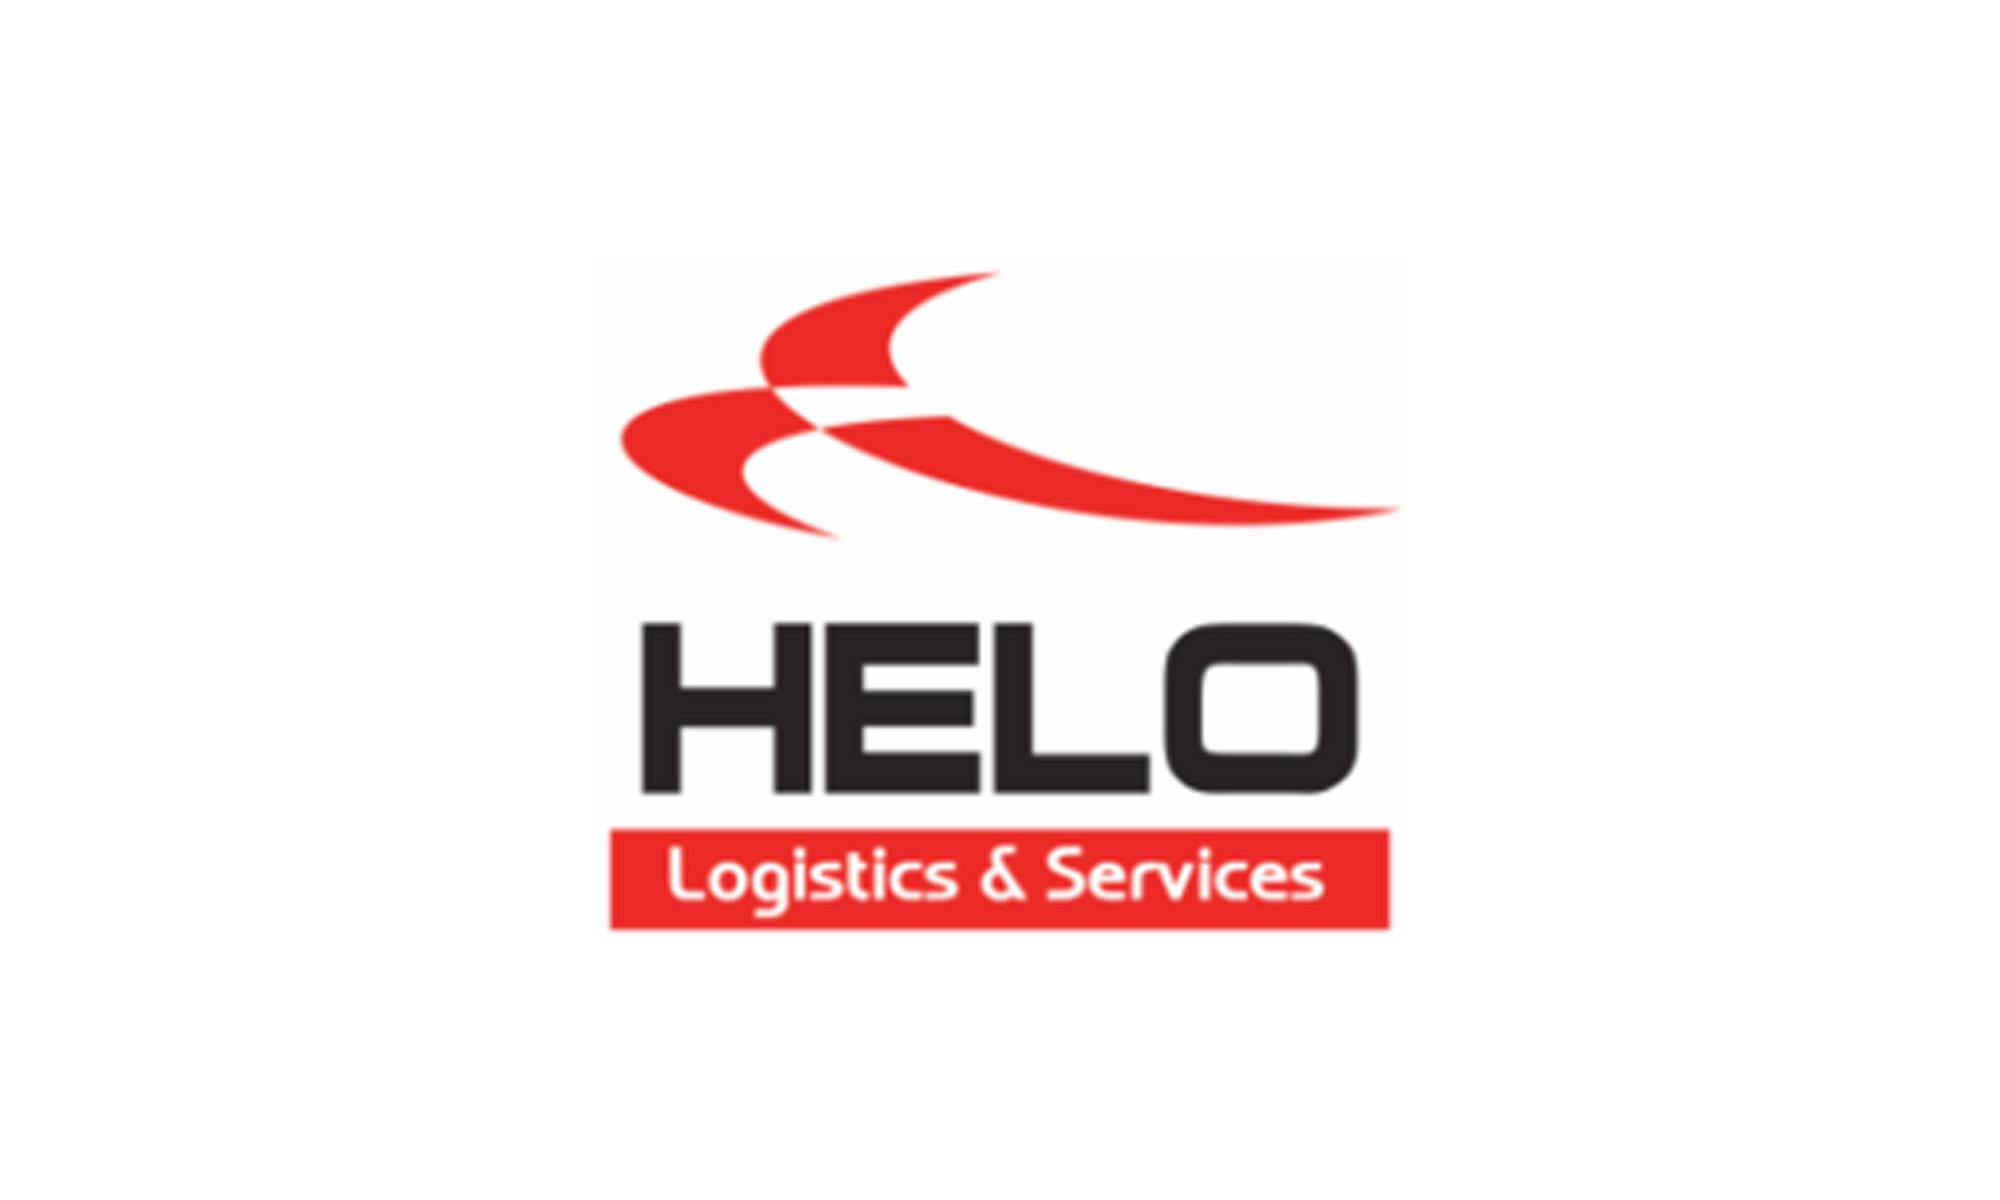 HELO GmbH Logistics & Services Weißenfels